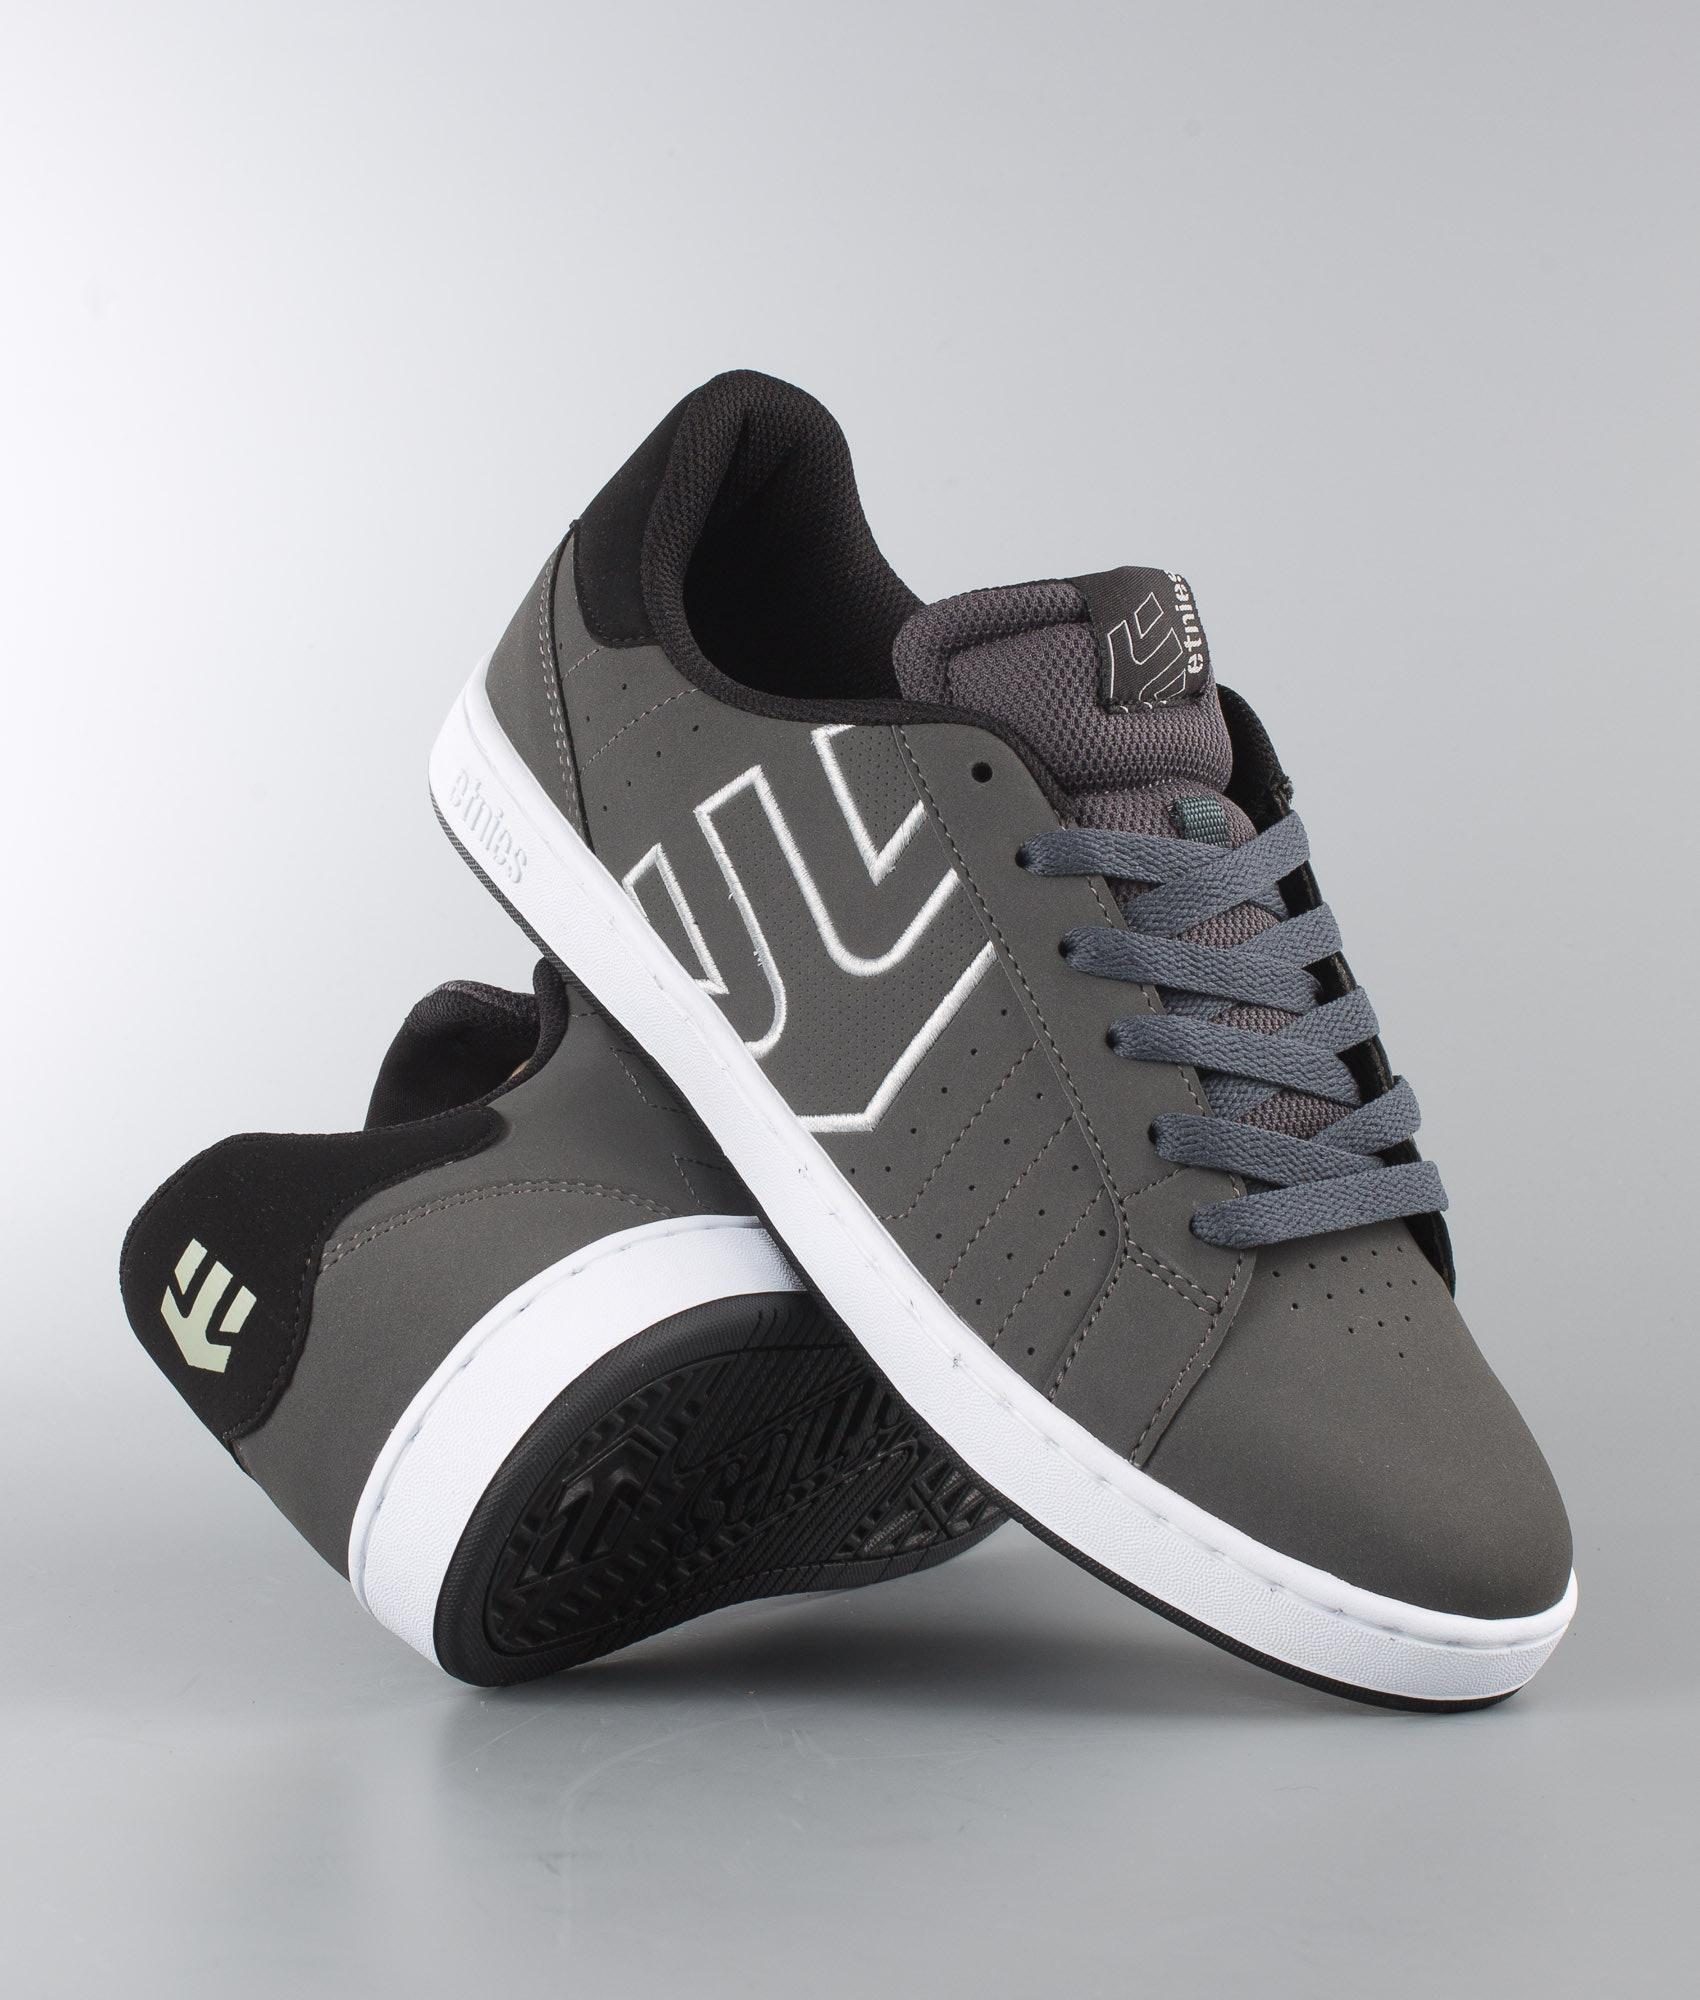 2913ff56582418 Etnies Fader LS Shoes Dark Grey/Black/White - Ridestore.com